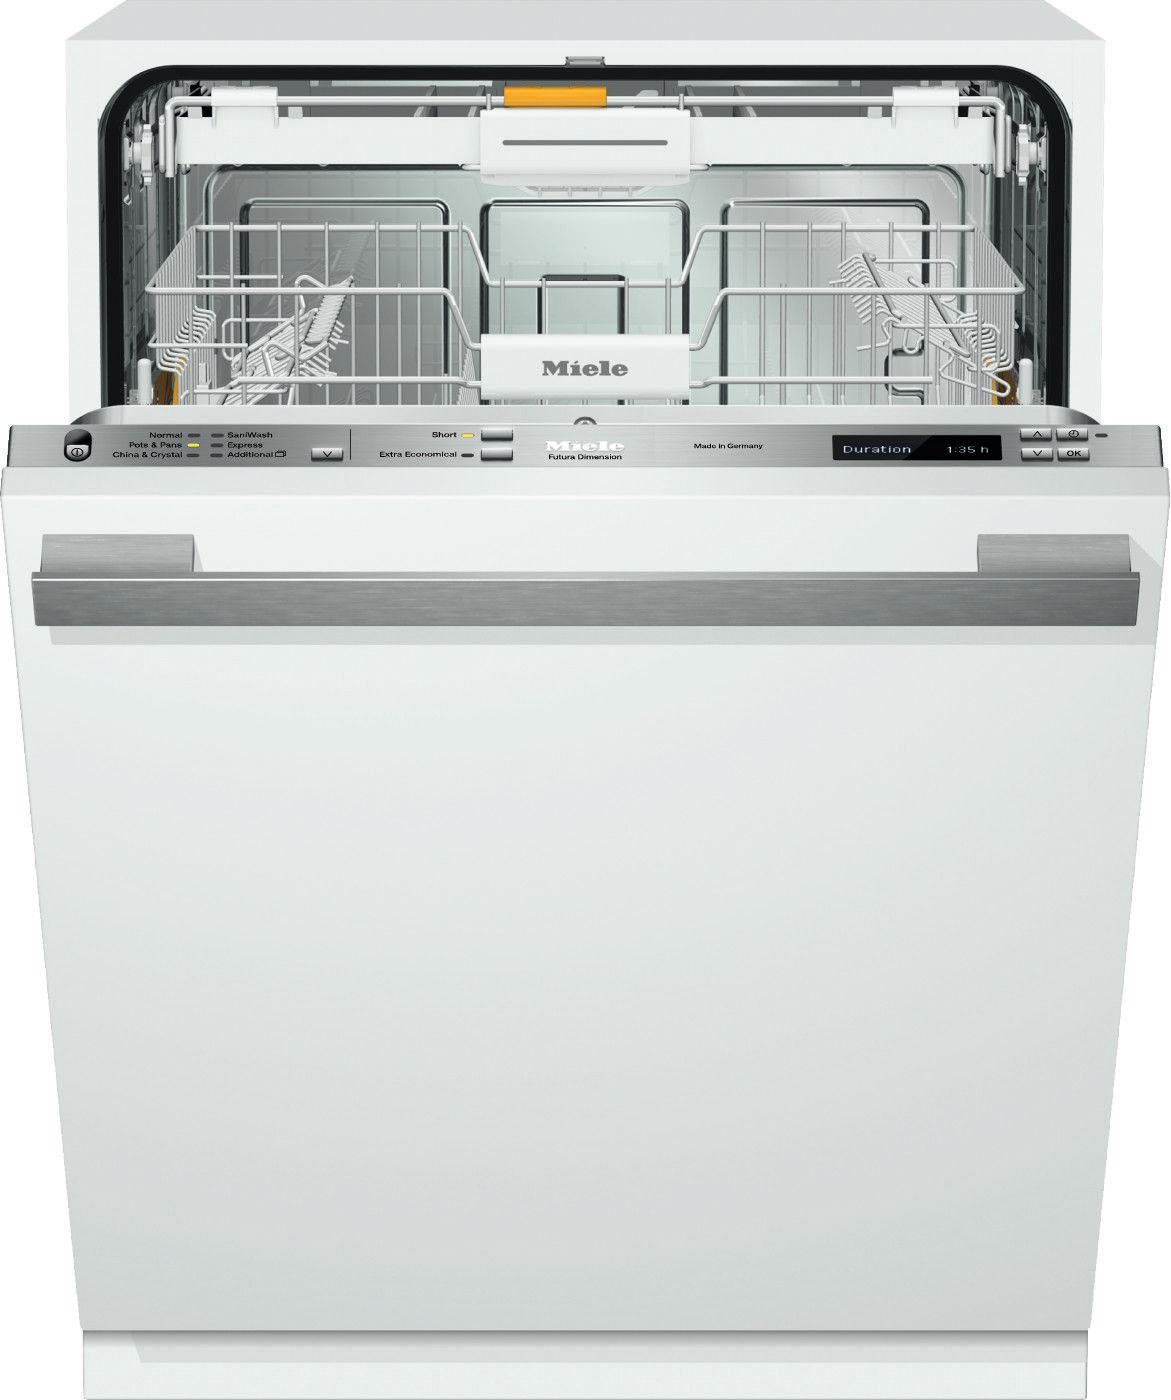 Miele G 6365 Scvi Dimension Dishwasher Integrated Dishwasher